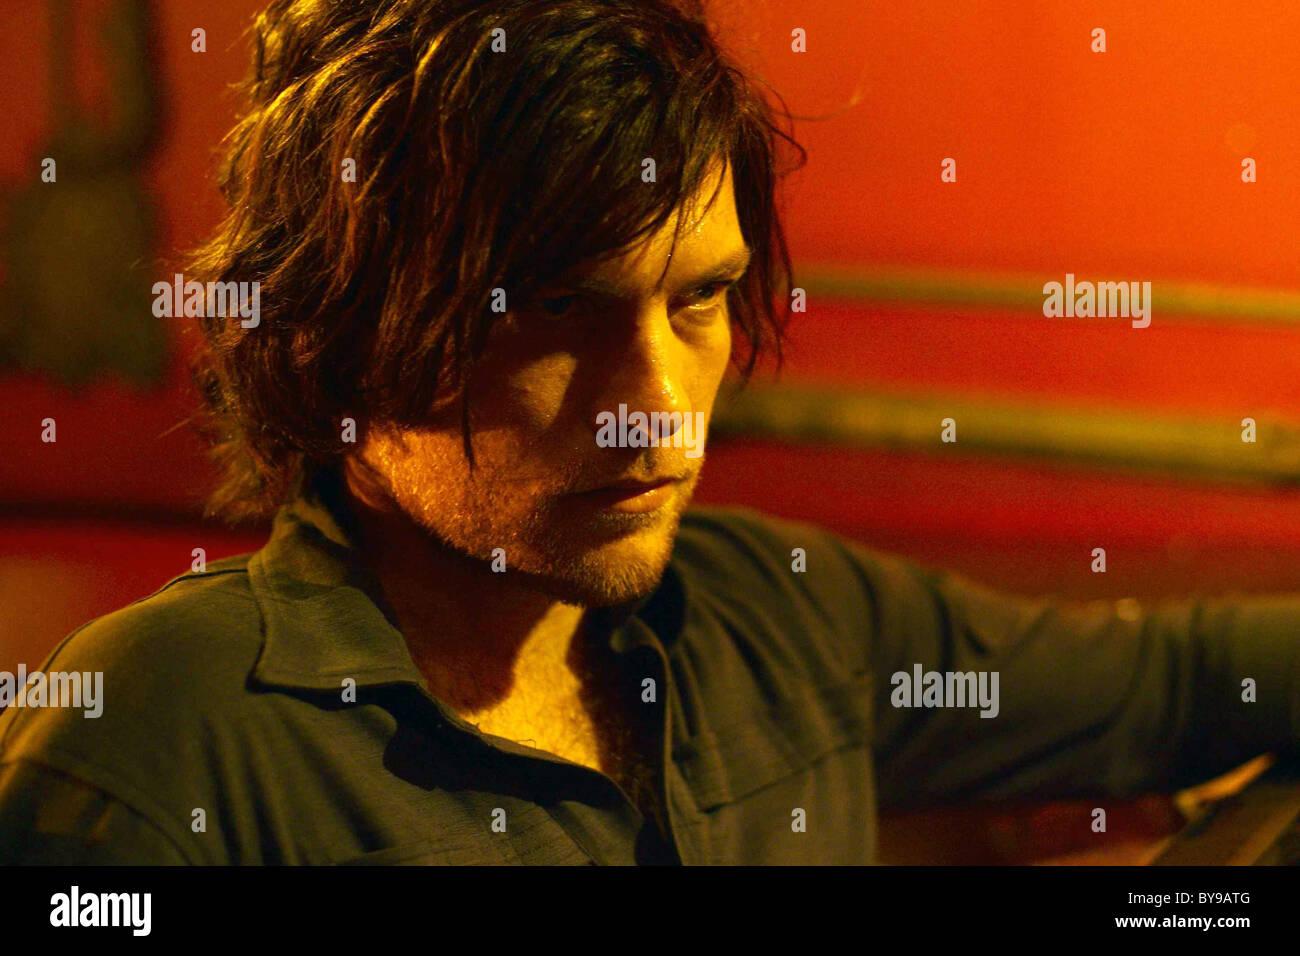 Macbeth Year : 2006 Australia Director : Geoffrey Wright Sam Worthington - Stock Image